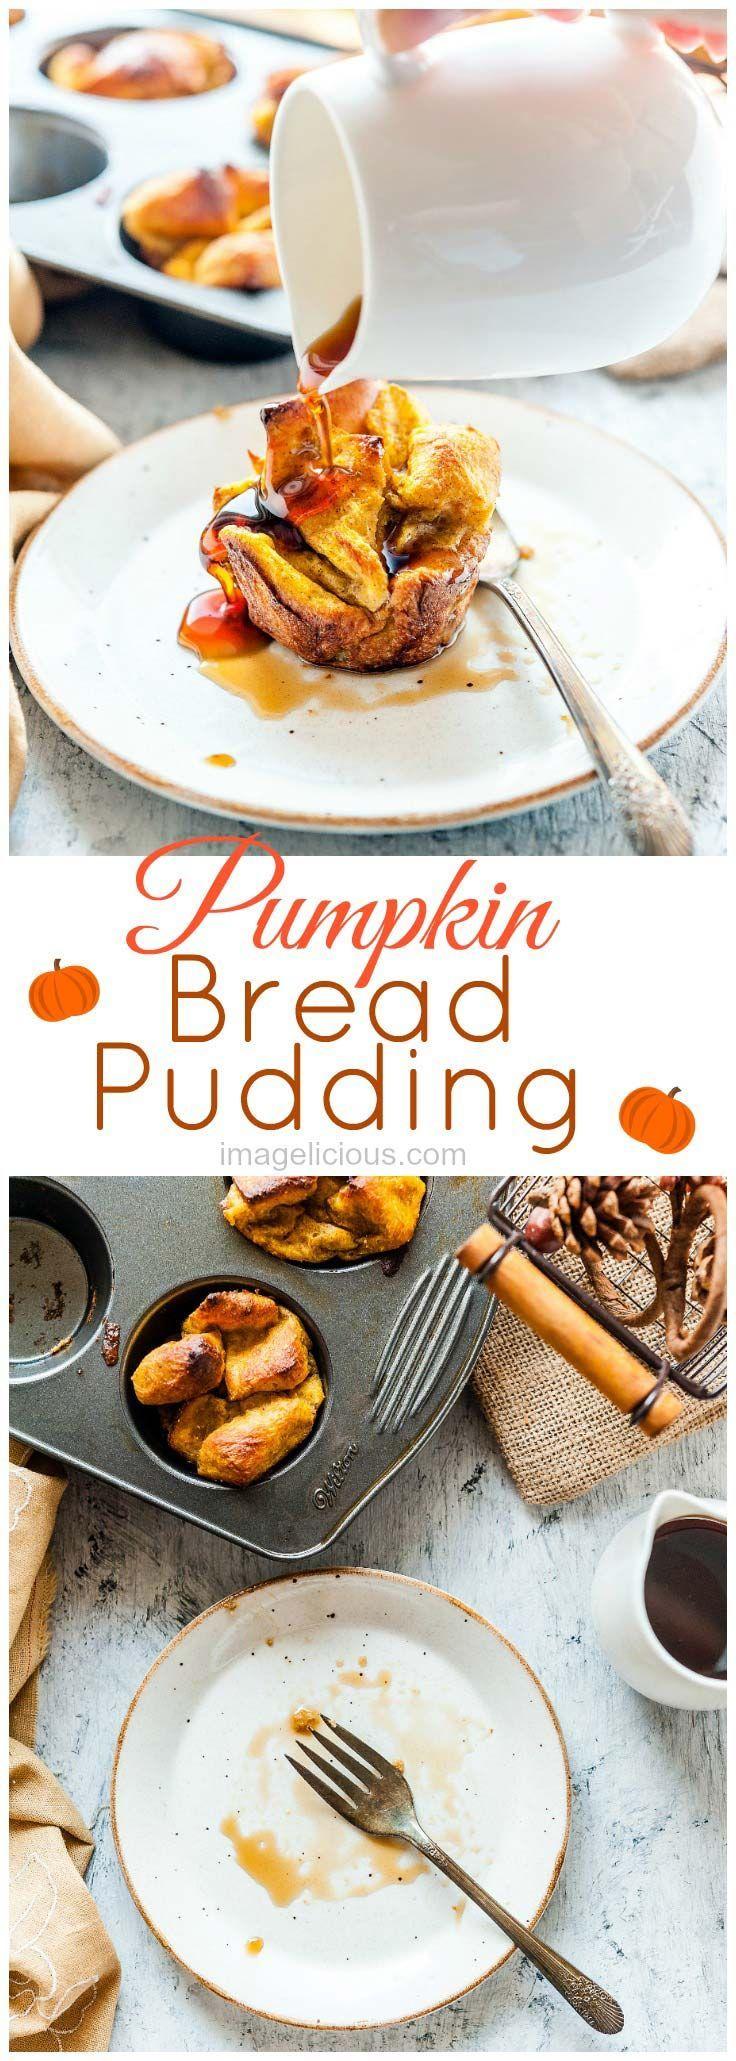 pumpkin | pumpkin recipes | pumpkin dessert | pumpkin breakfast | pumpkin bread pudding | bread | pudding | bread pudding | breakfast | brunch | fall | autumn | thanksgiving | maple syrup | easy | baking | cozy | Imagelicious